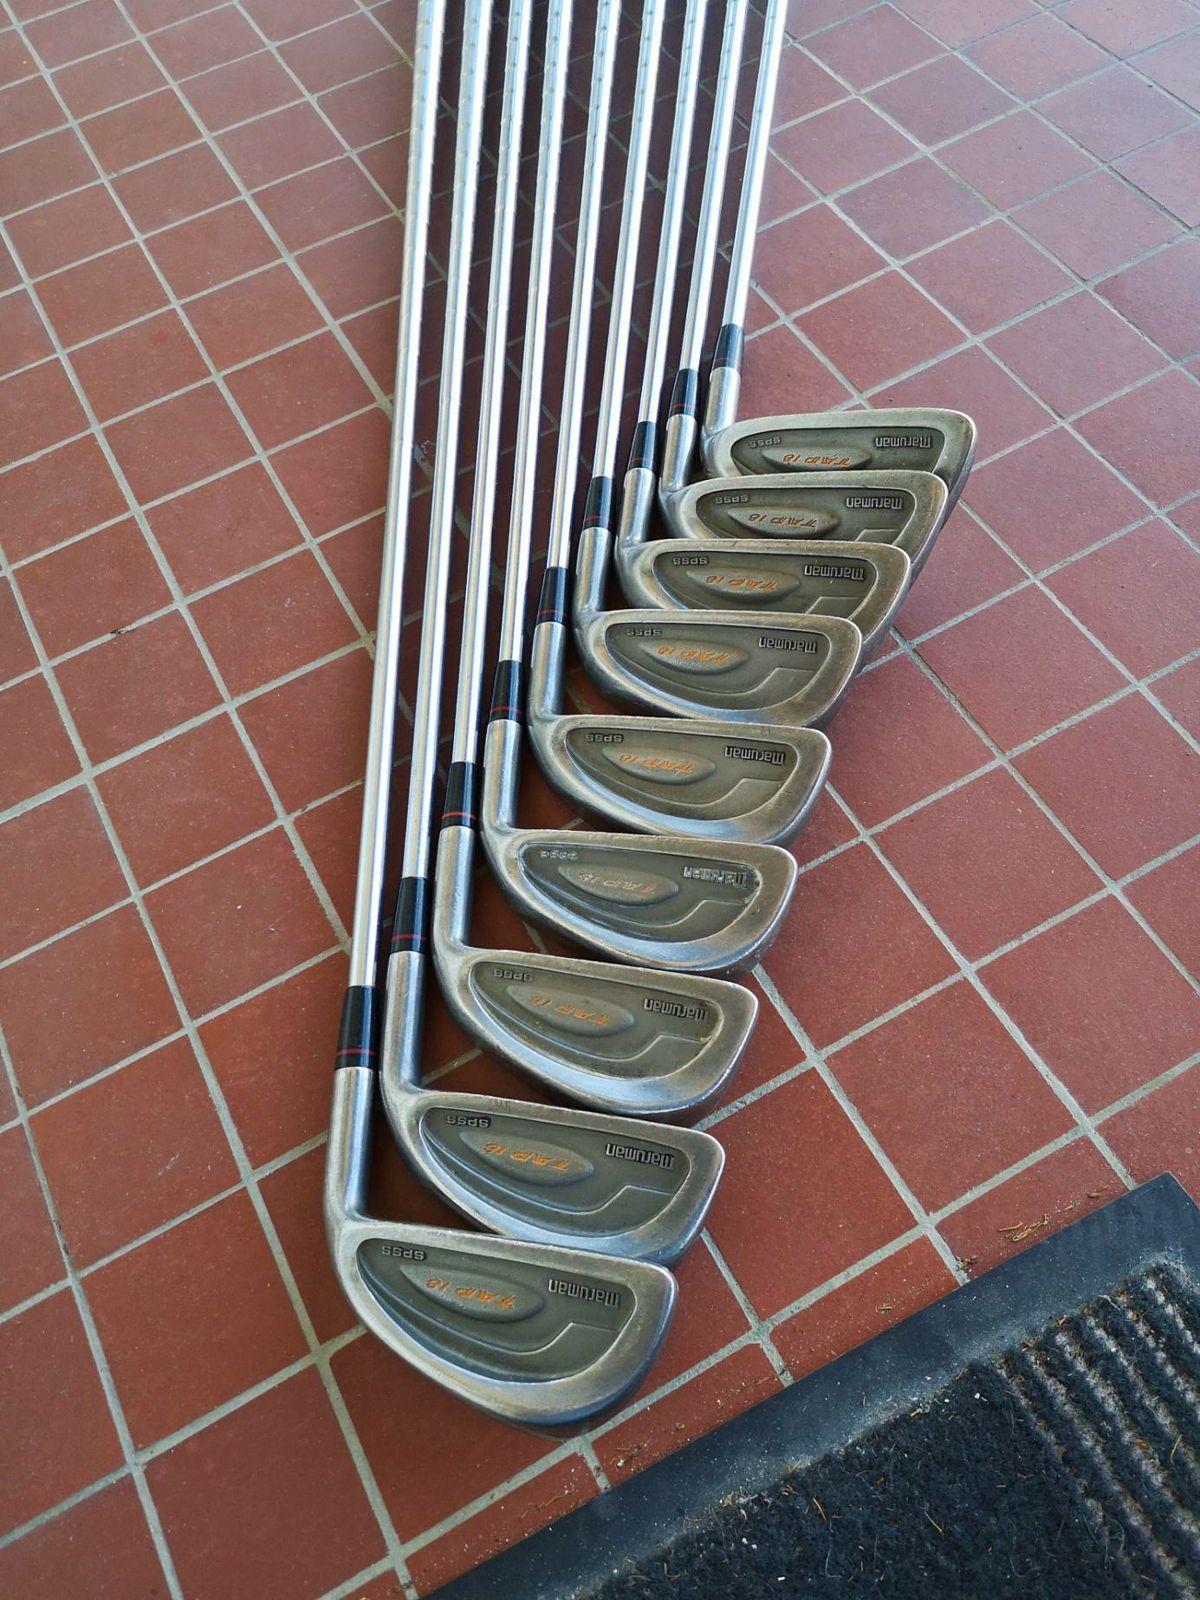 Vends serie de clubs de golf Maruman tap 18